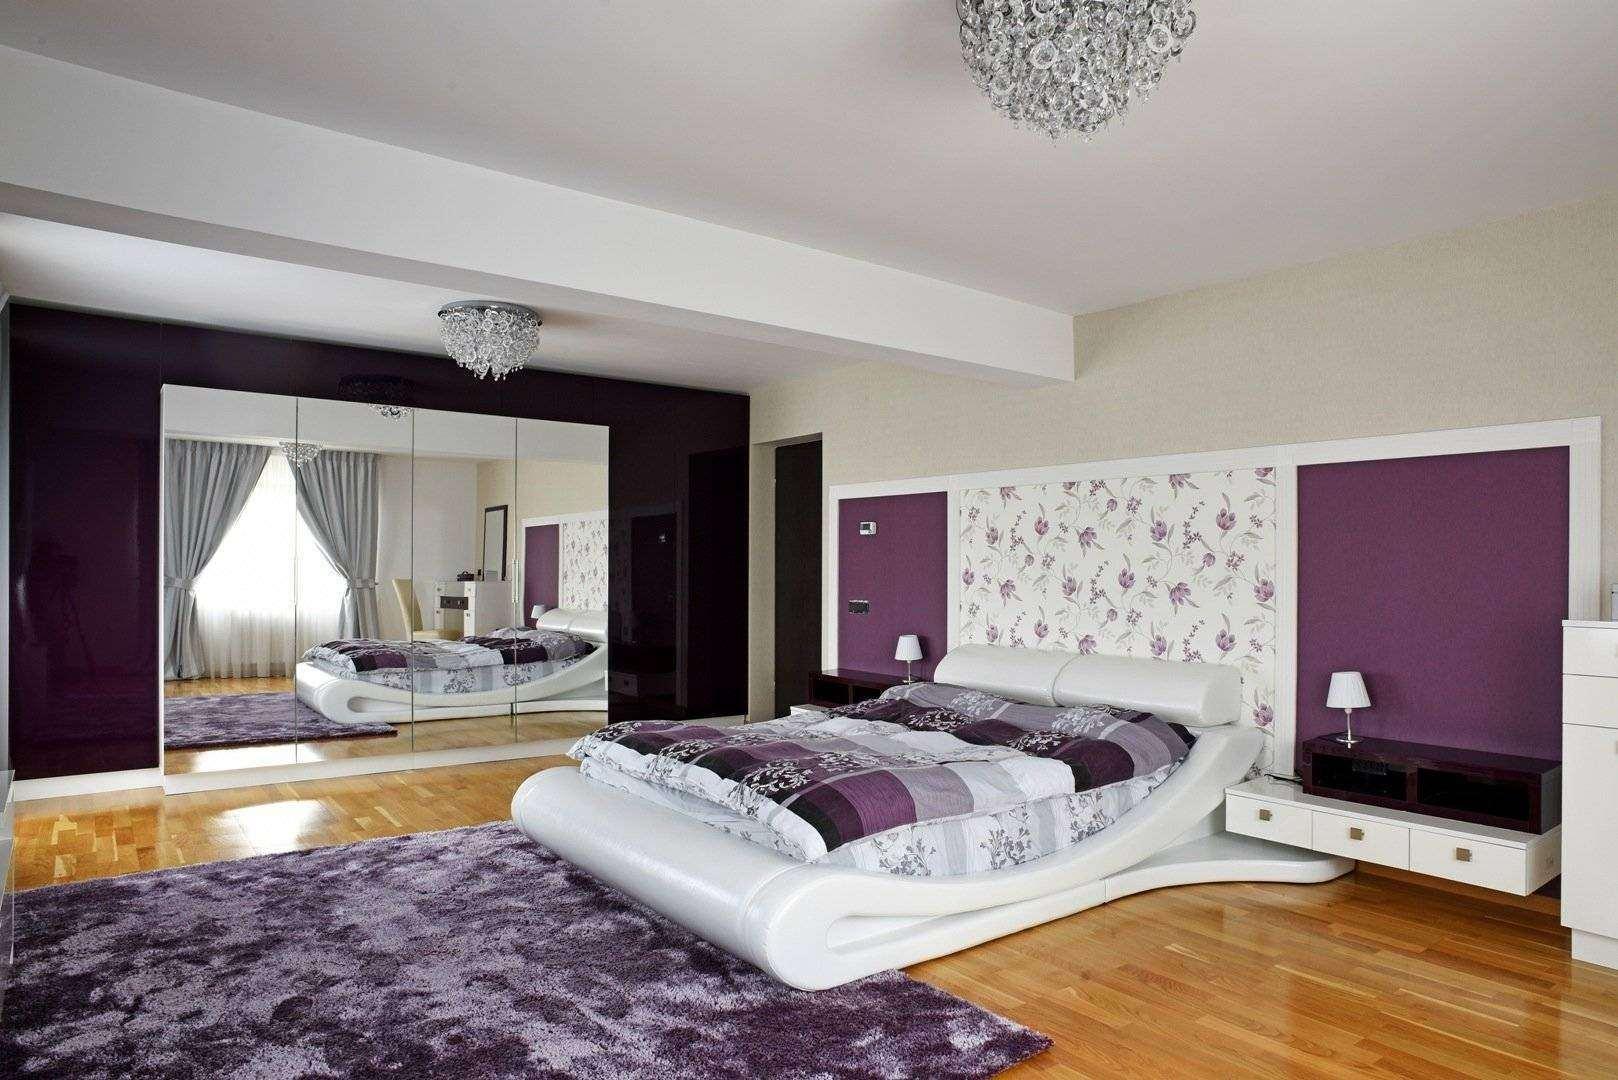 <a href=&quot;mobila dormitor la comanda moderna &quot;>Ansamblu dormitor matrimonial <img src='http://www.unican.ro/wp-content/themes/vita/img/dreapta.png' class='pull-right hidden-xs' style='margin-right:-10px;margin-top:-10px; max-height:41px'></a>